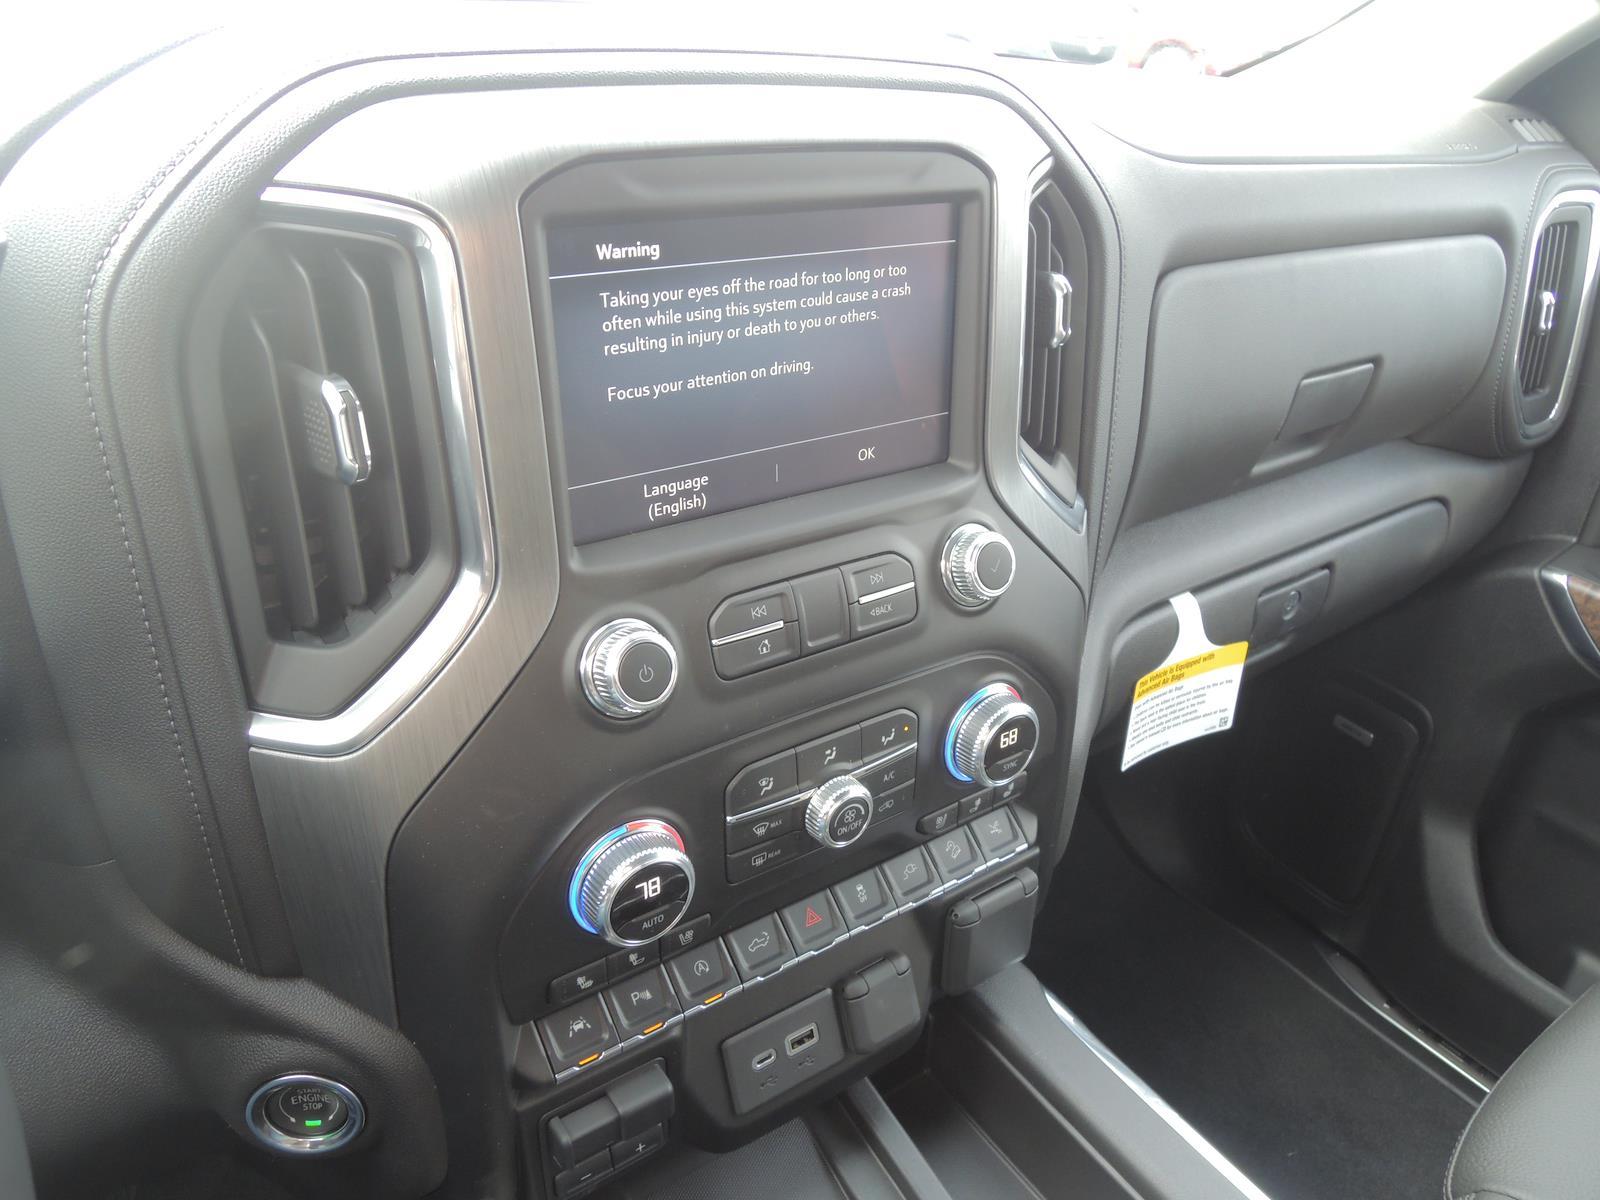 2021 GMC Sierra 1500 Crew Cab 4x4, Pickup #MT434 - photo 25